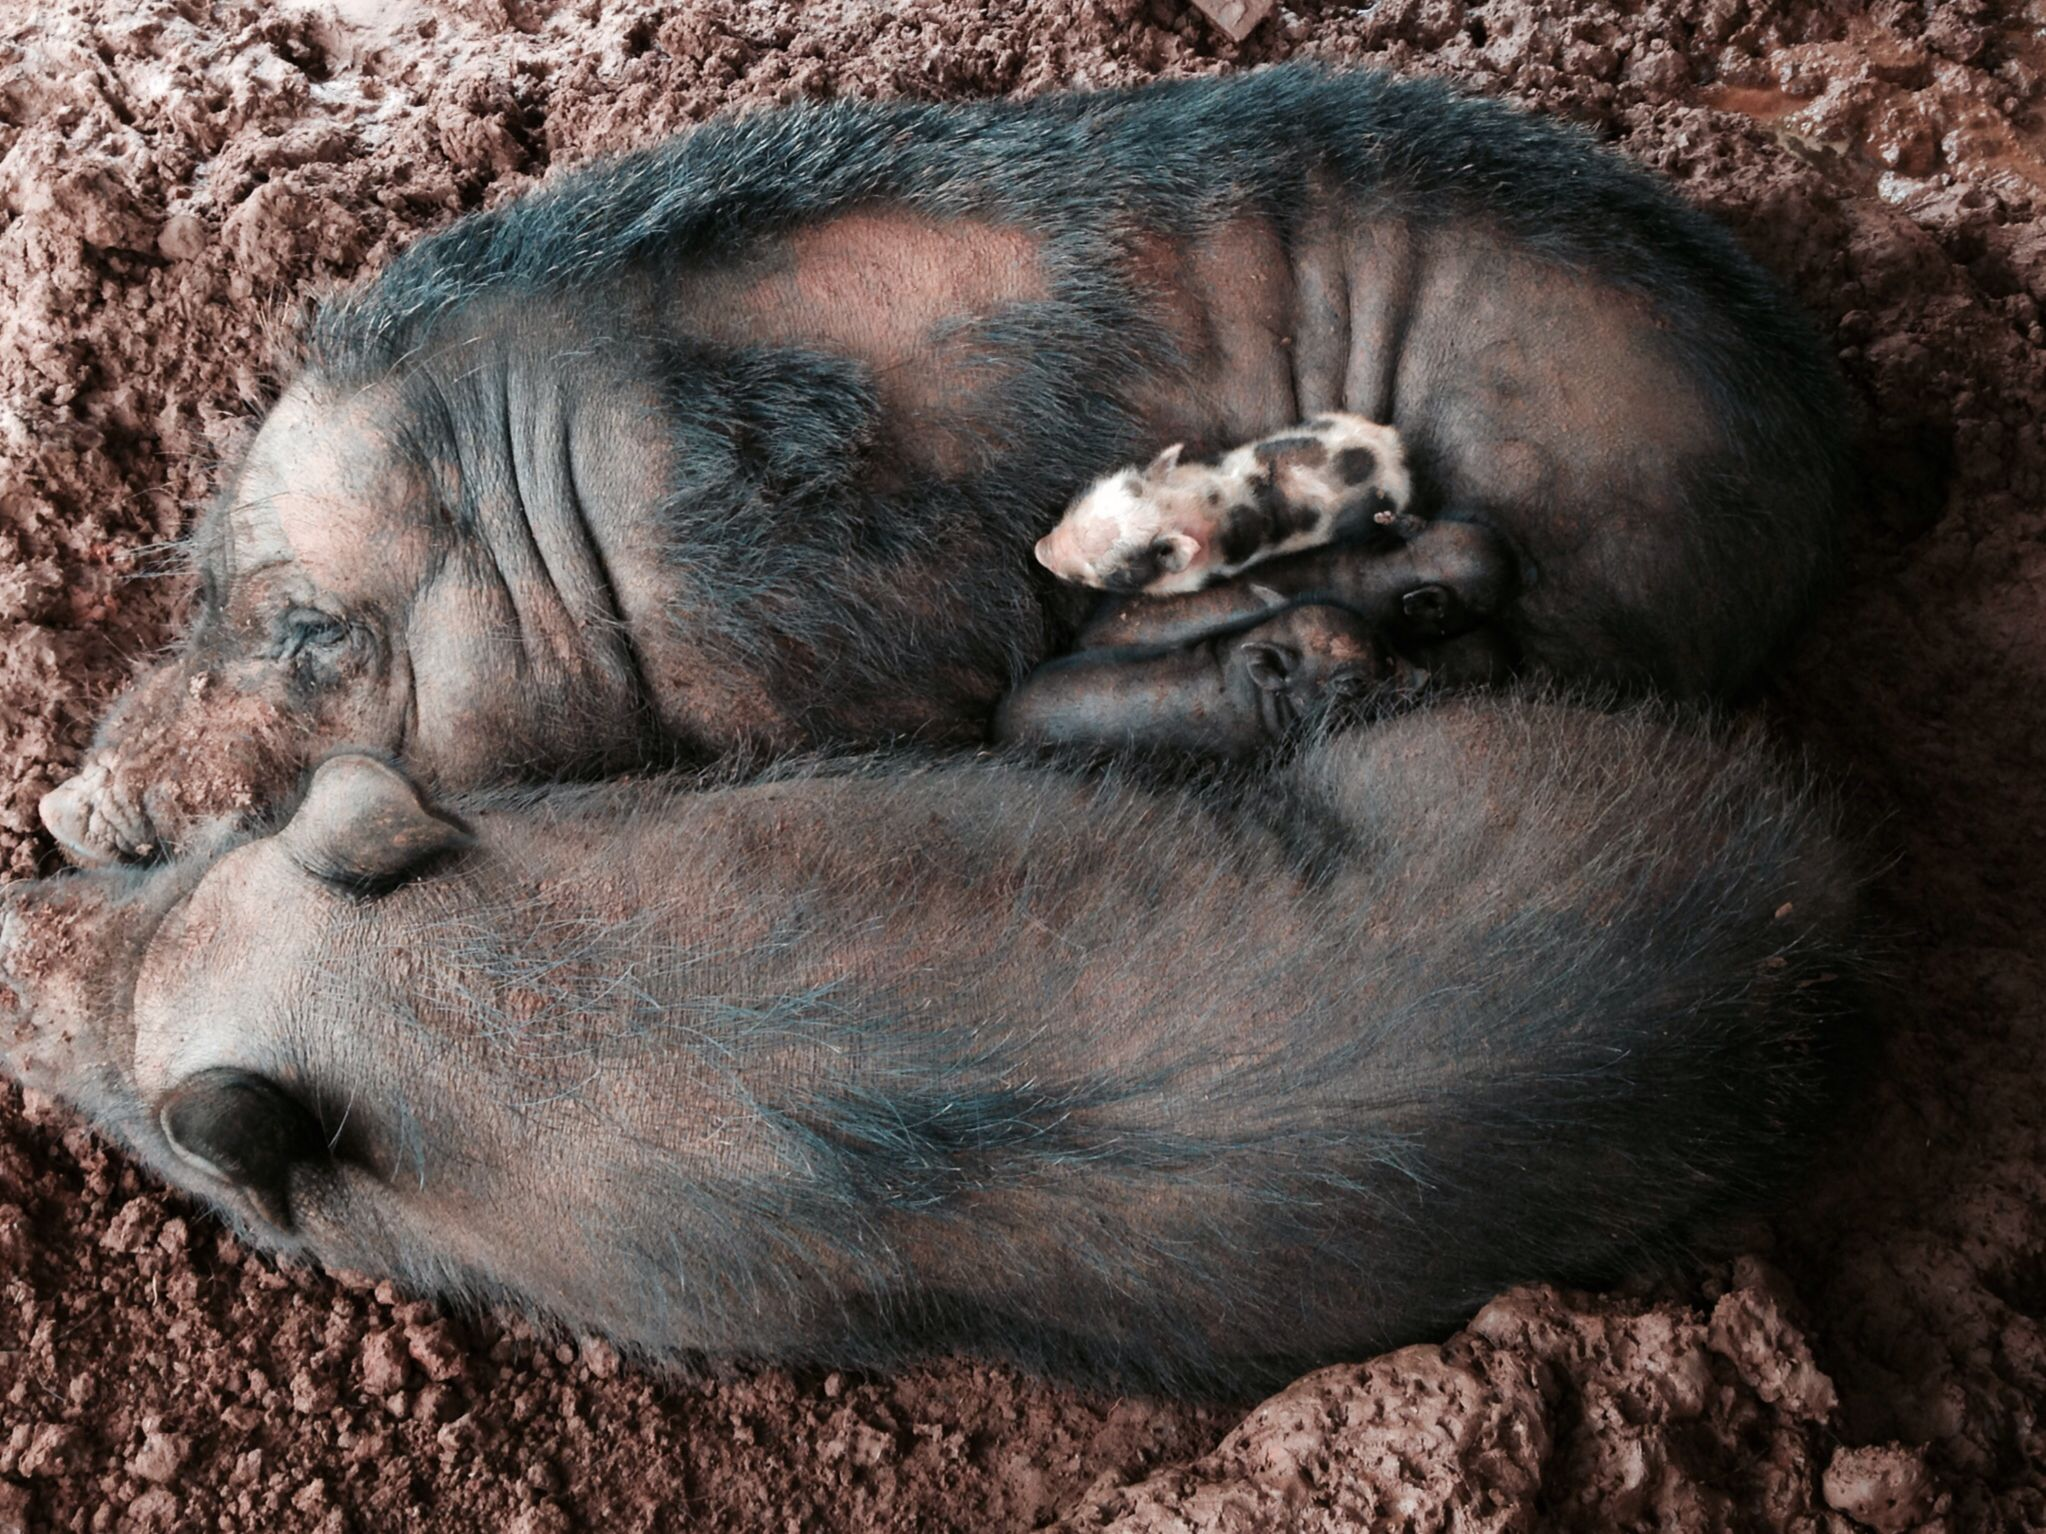 Family time!! Piggy pile!